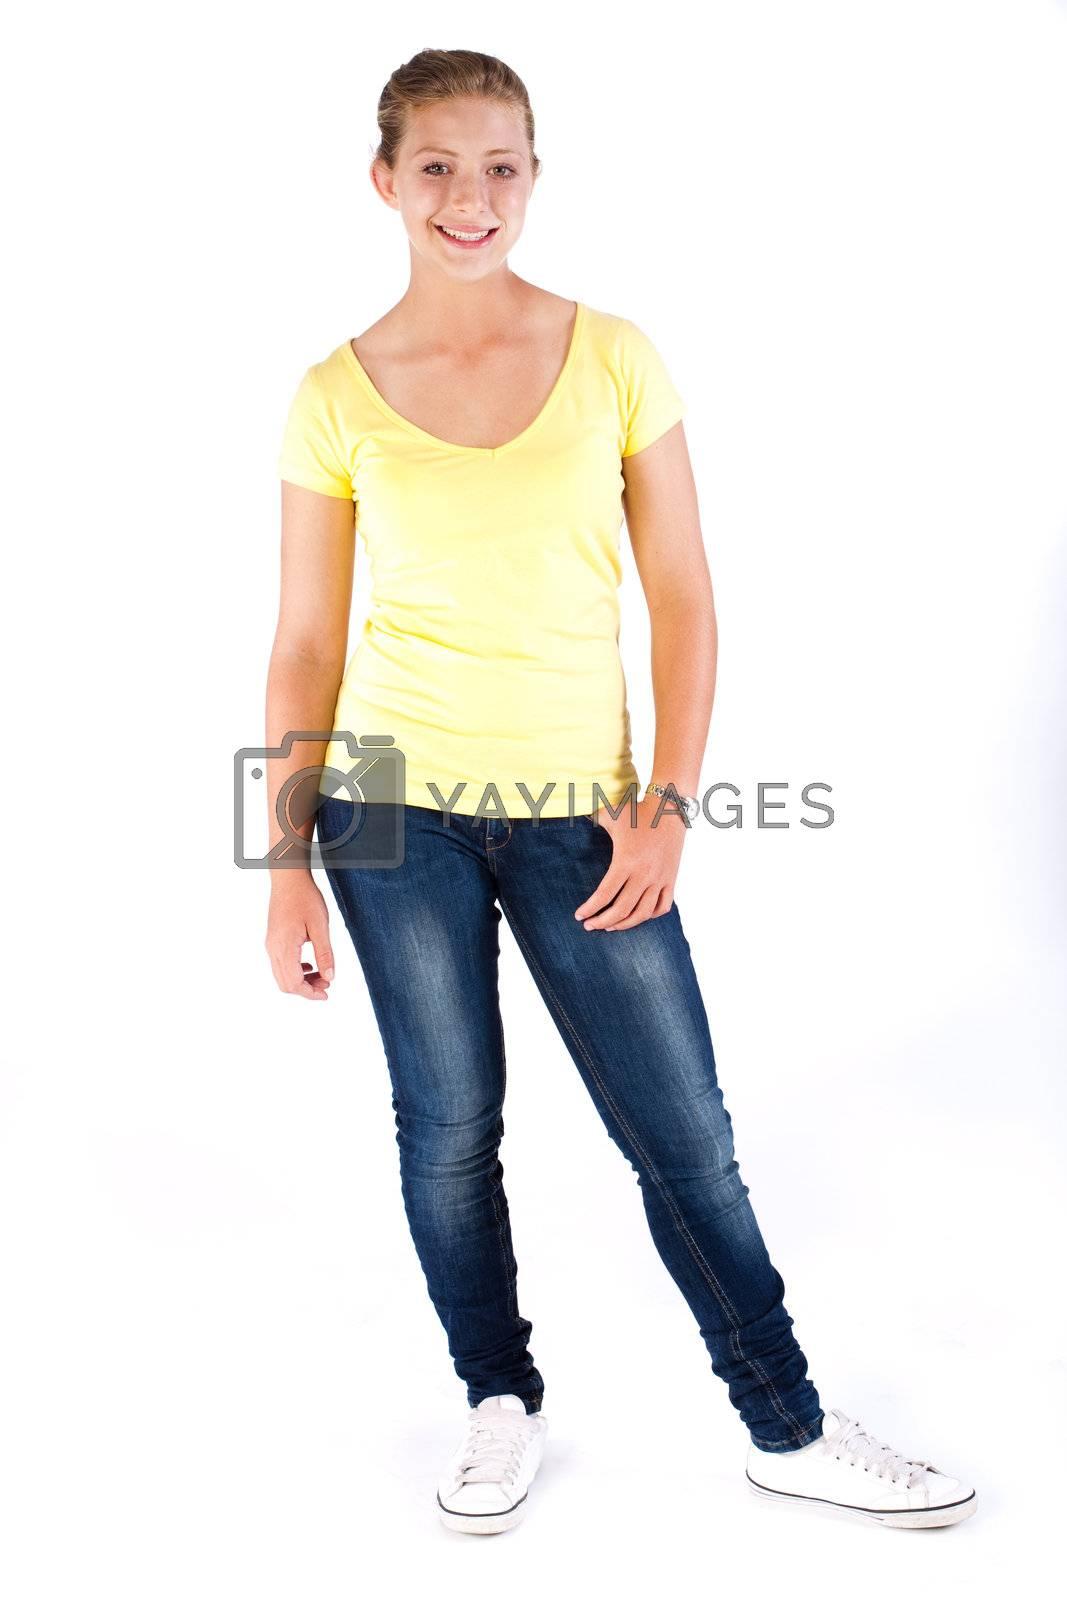 Fashion model posing in studio isolated on white background.